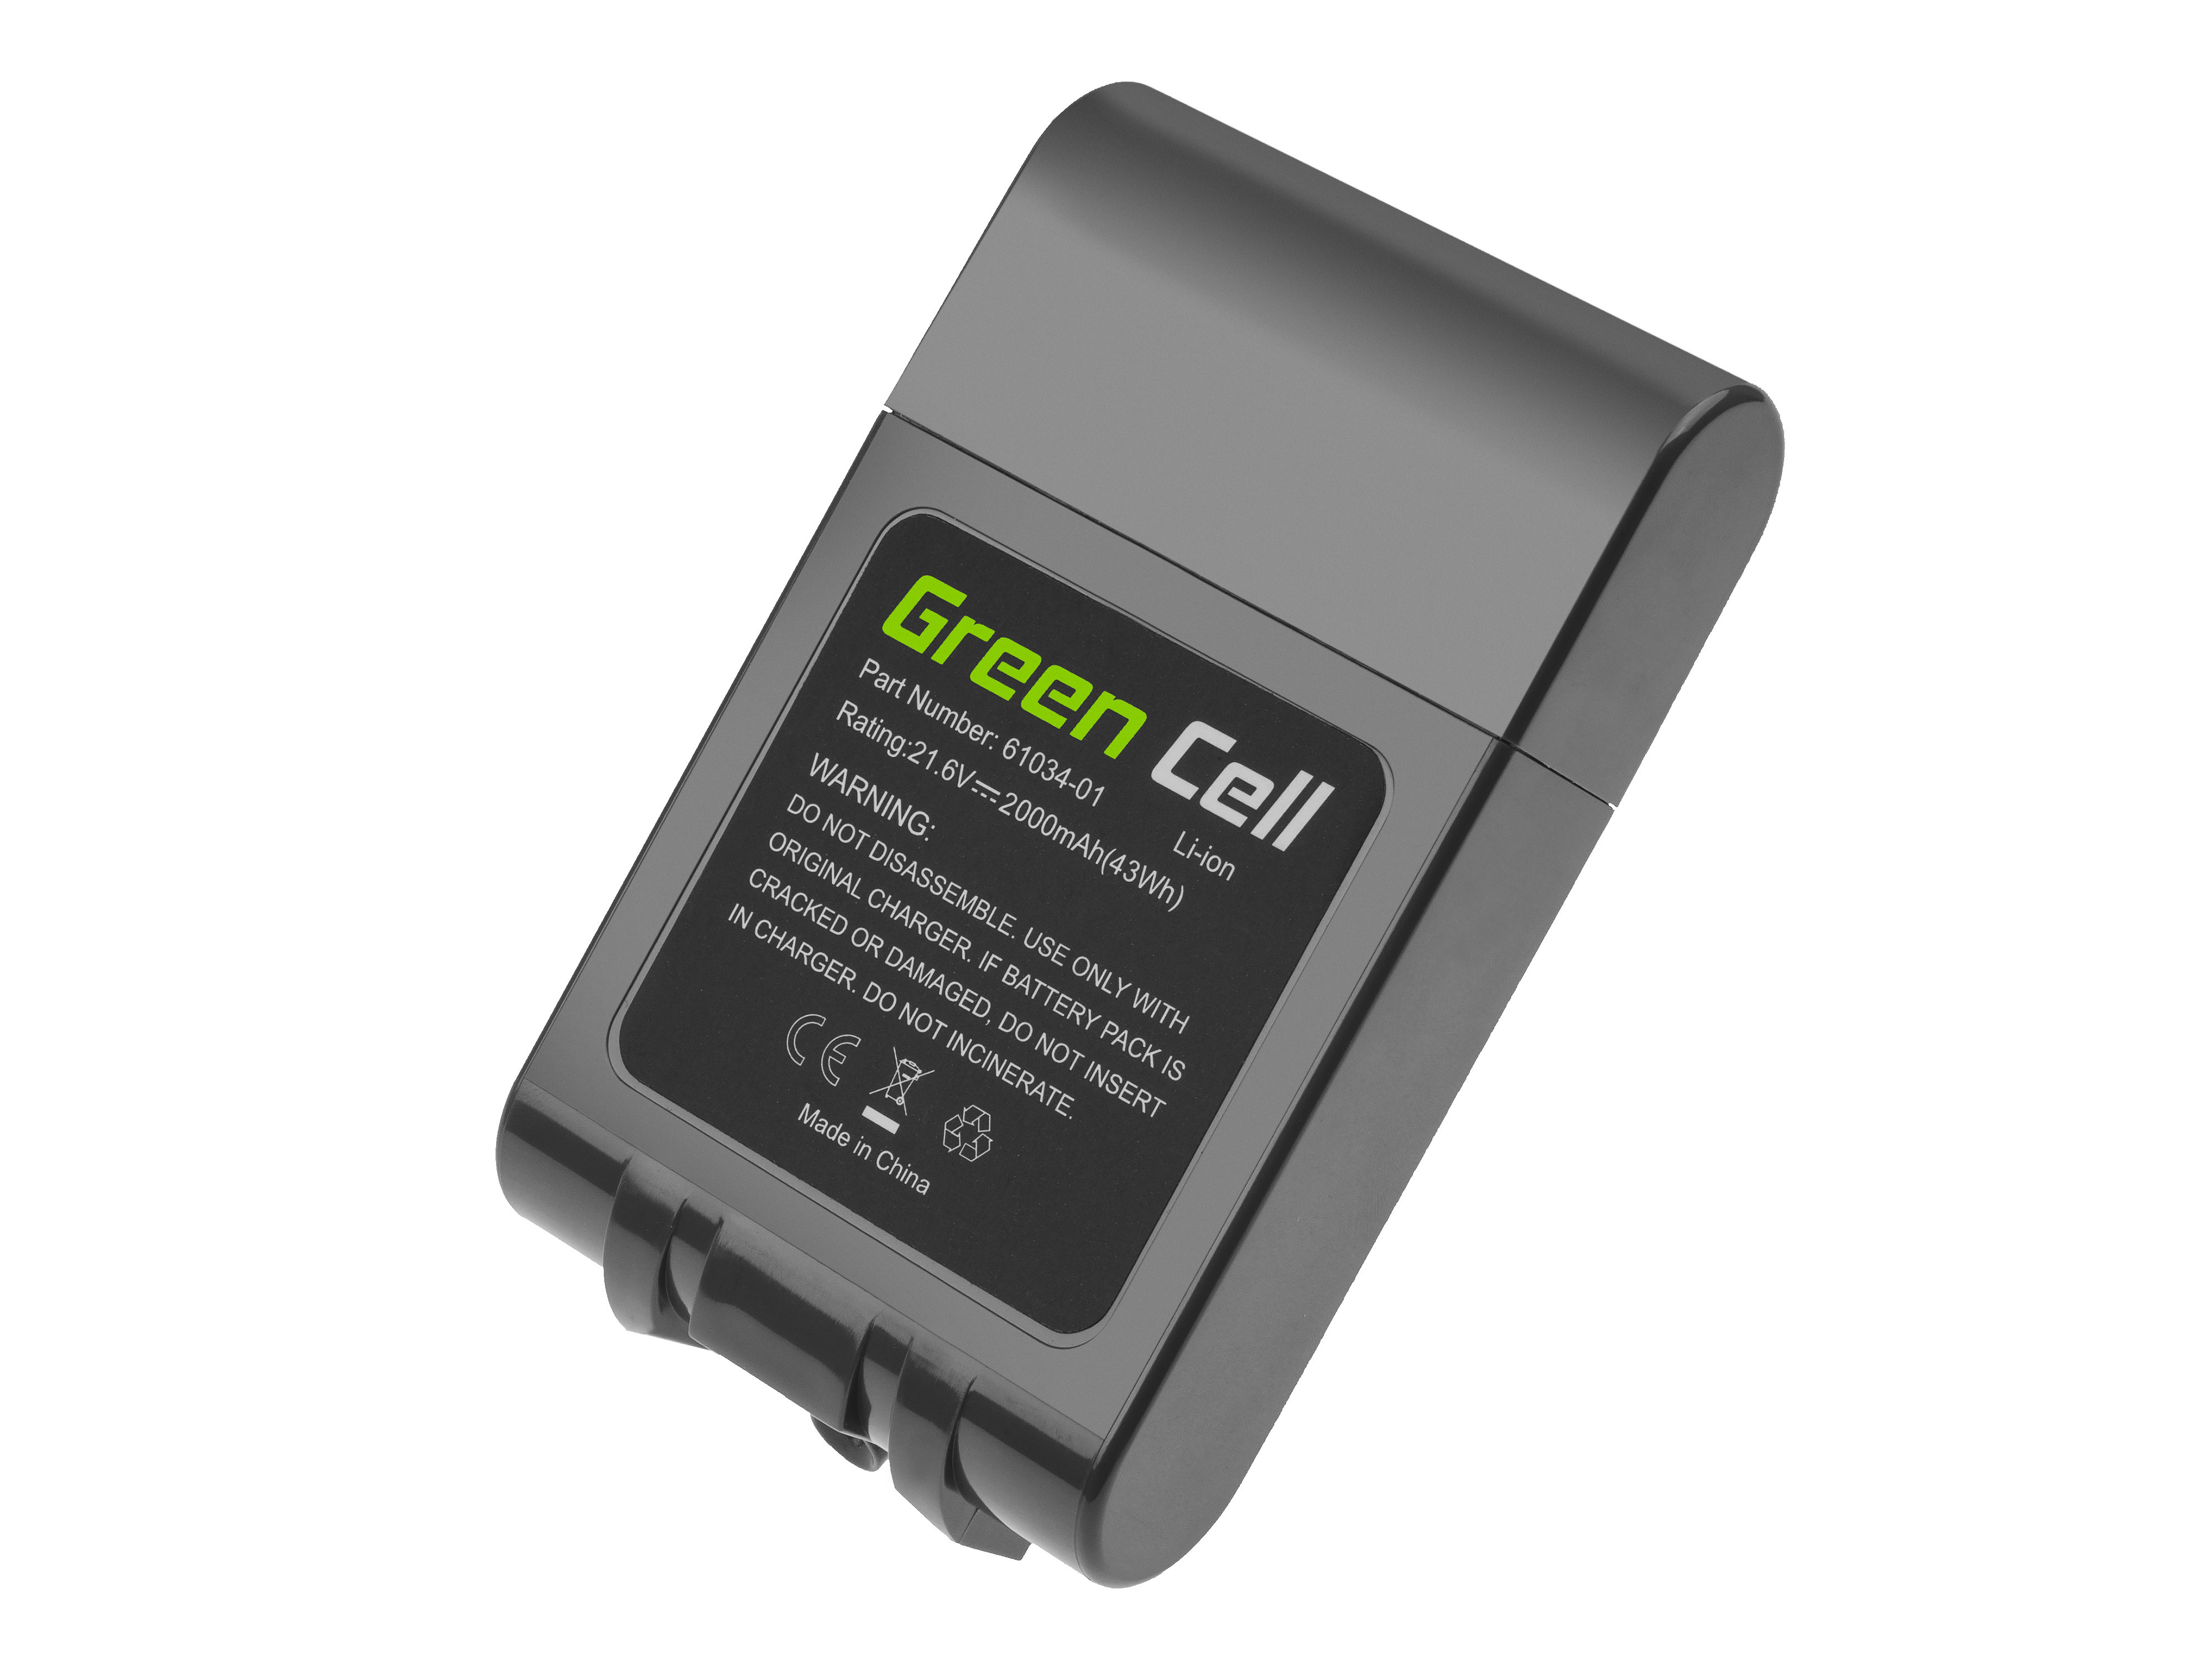 Green Cell® Battery (2Ah 21.6V) 967810-02 209432-01 209472-01 for Dyson V6 DC58 DC59 DC61 DC62 DC72 DC74